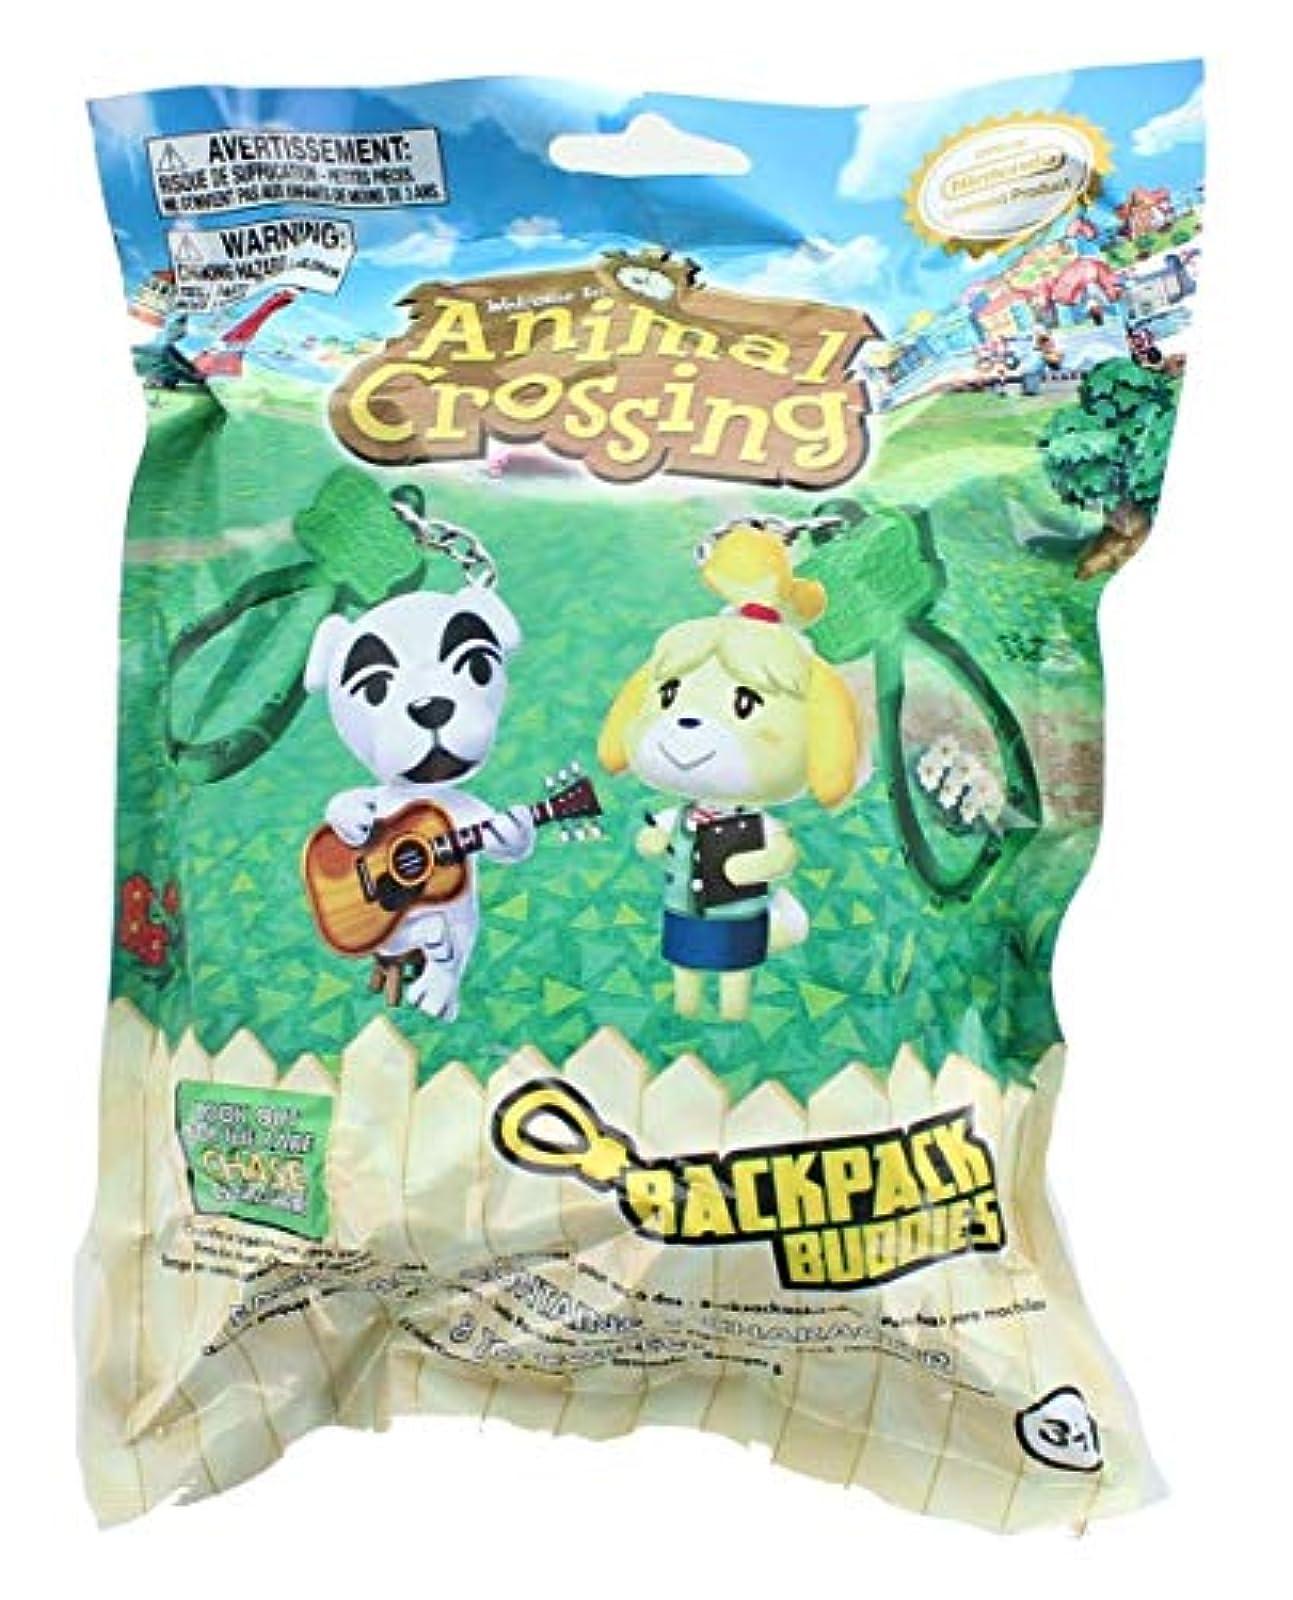 Animal Crossing Backpack Buddies Blind Bag Mini Toy Figure